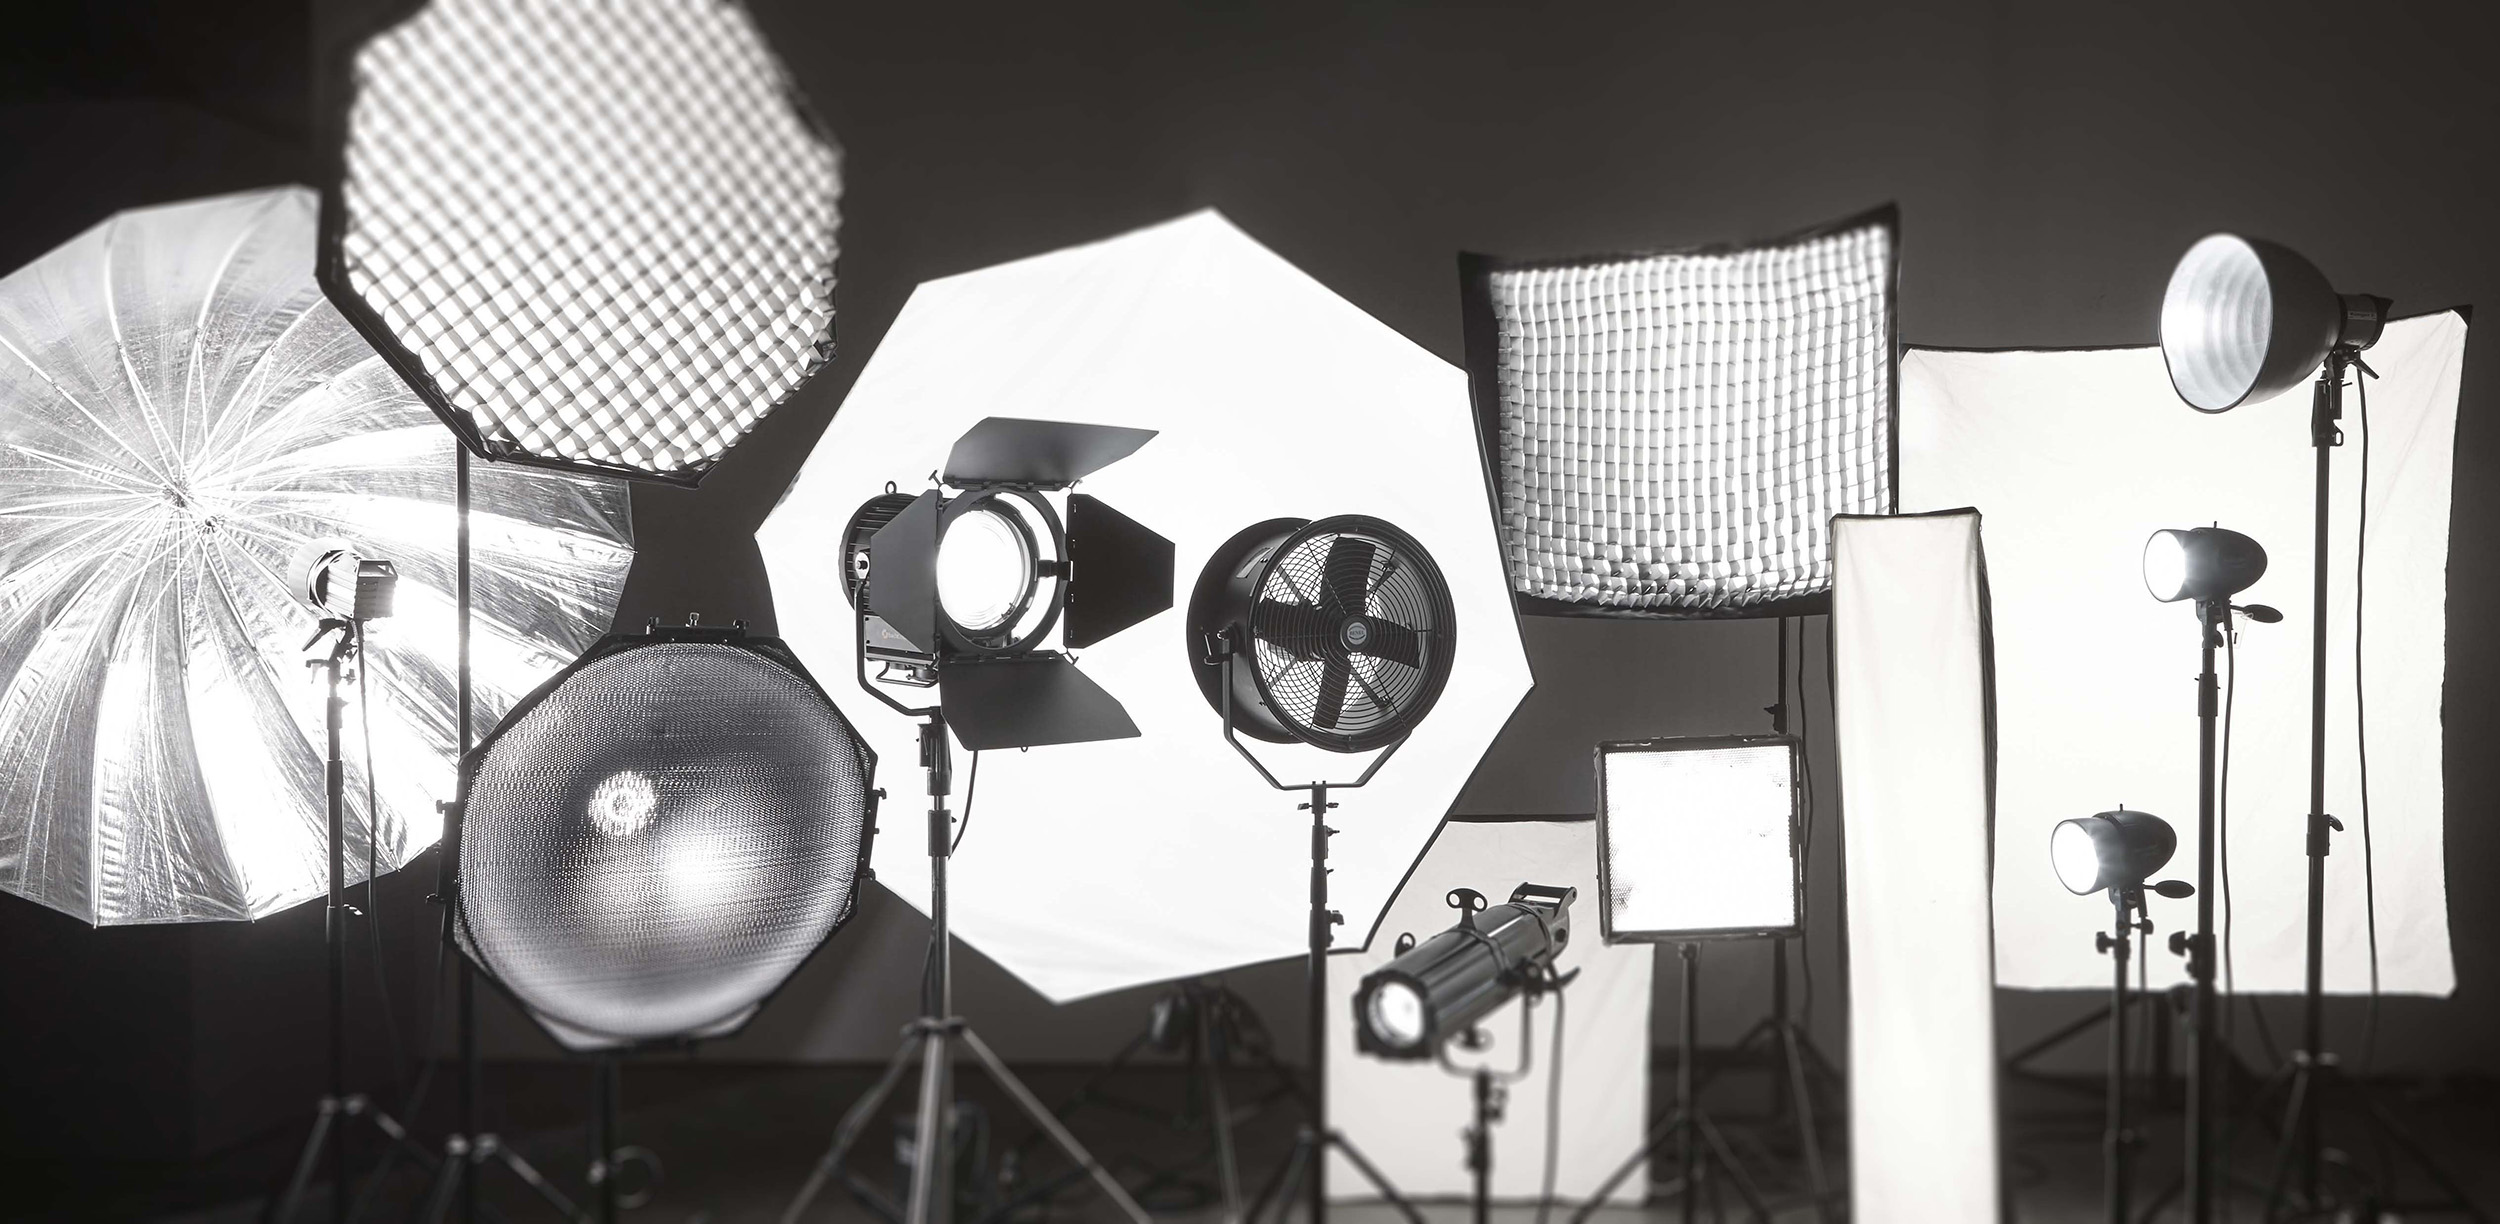 Fotostudio, Fotografen, België, Limburg, Paul Delaet, Fotografisch atelier, commercieel, advertising, fotografie